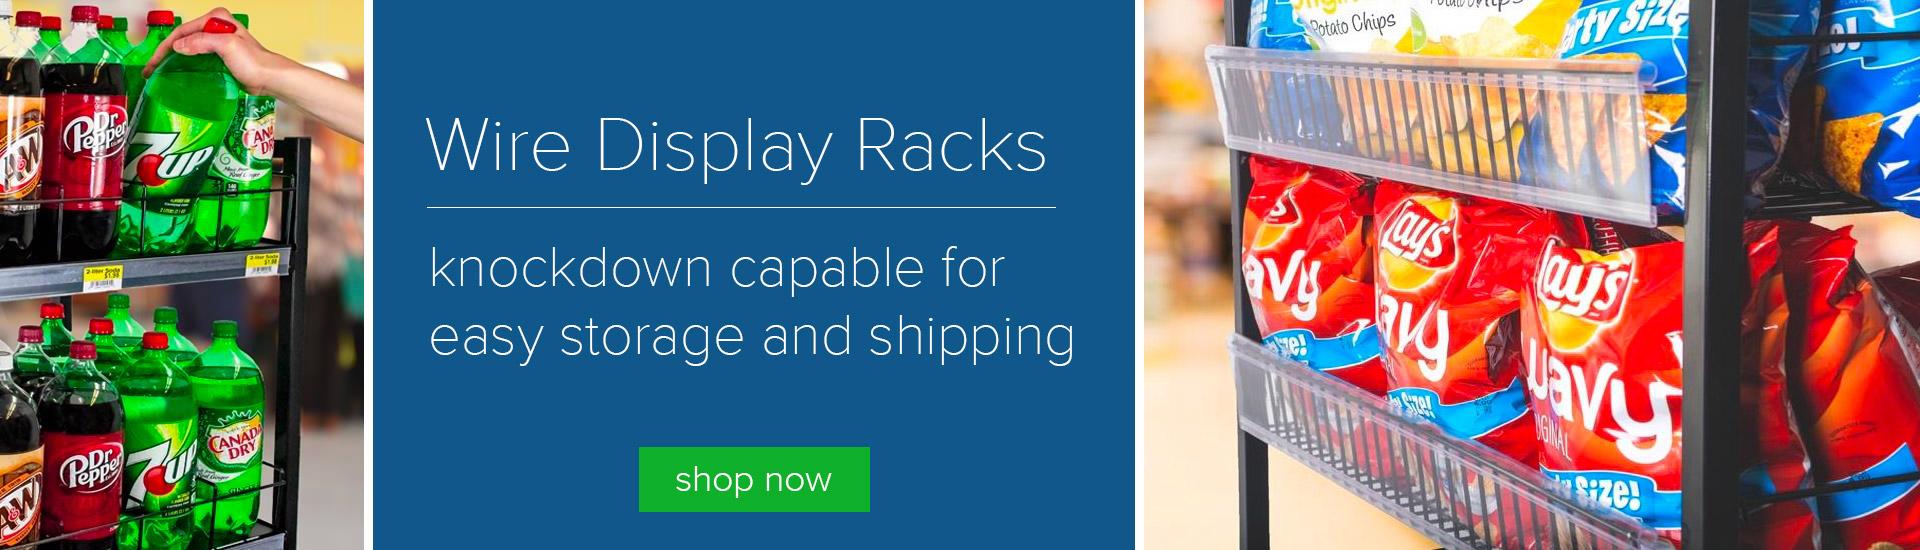 Wire Display Racks